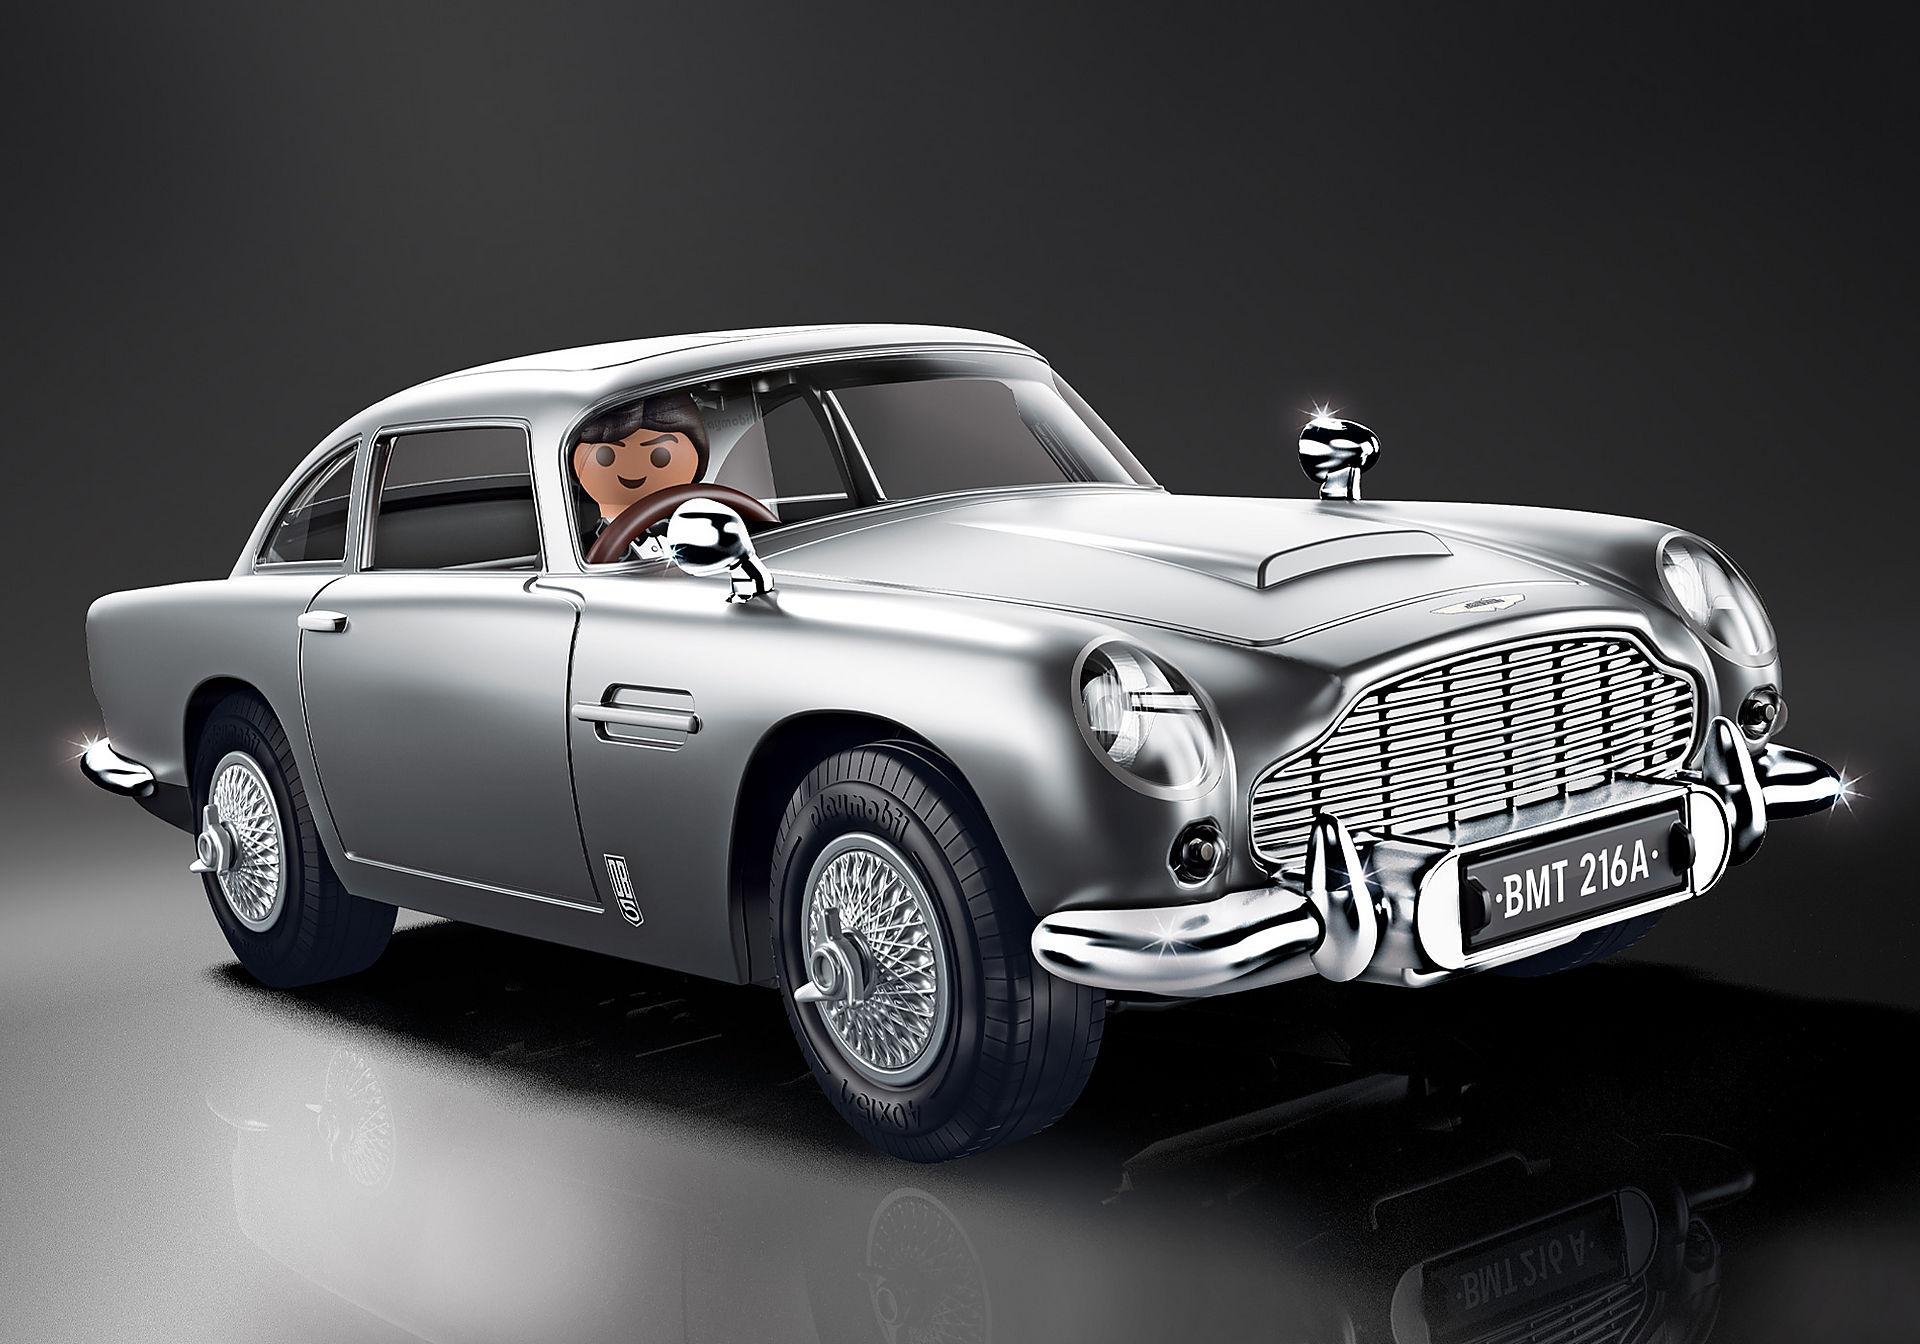 70578 James Bond Aston Martin DB5 - Goldfinger Edition zoom image1